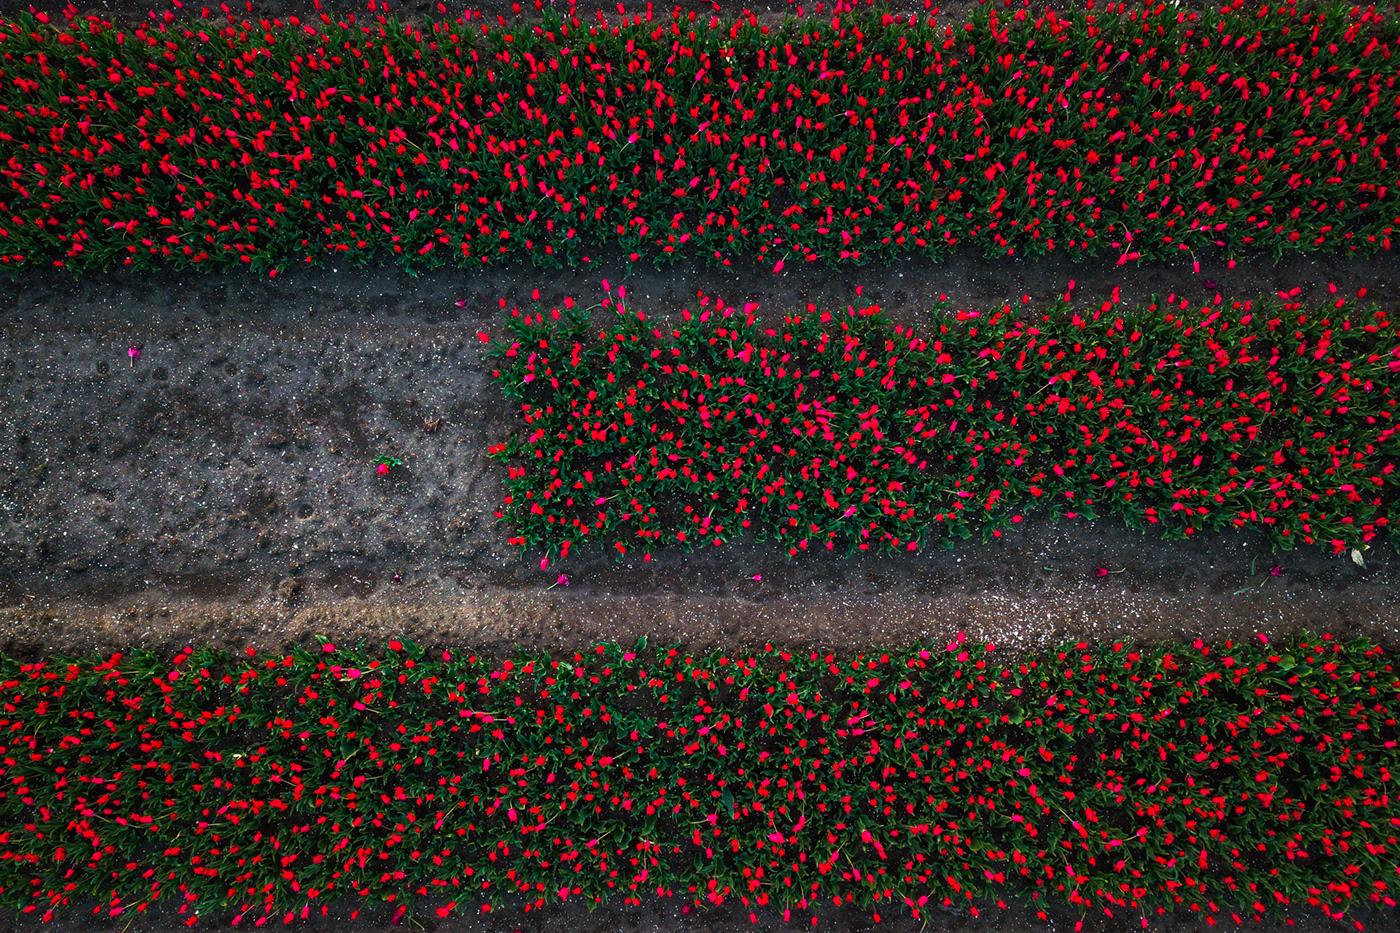 Flower Carpets by Albert Dros